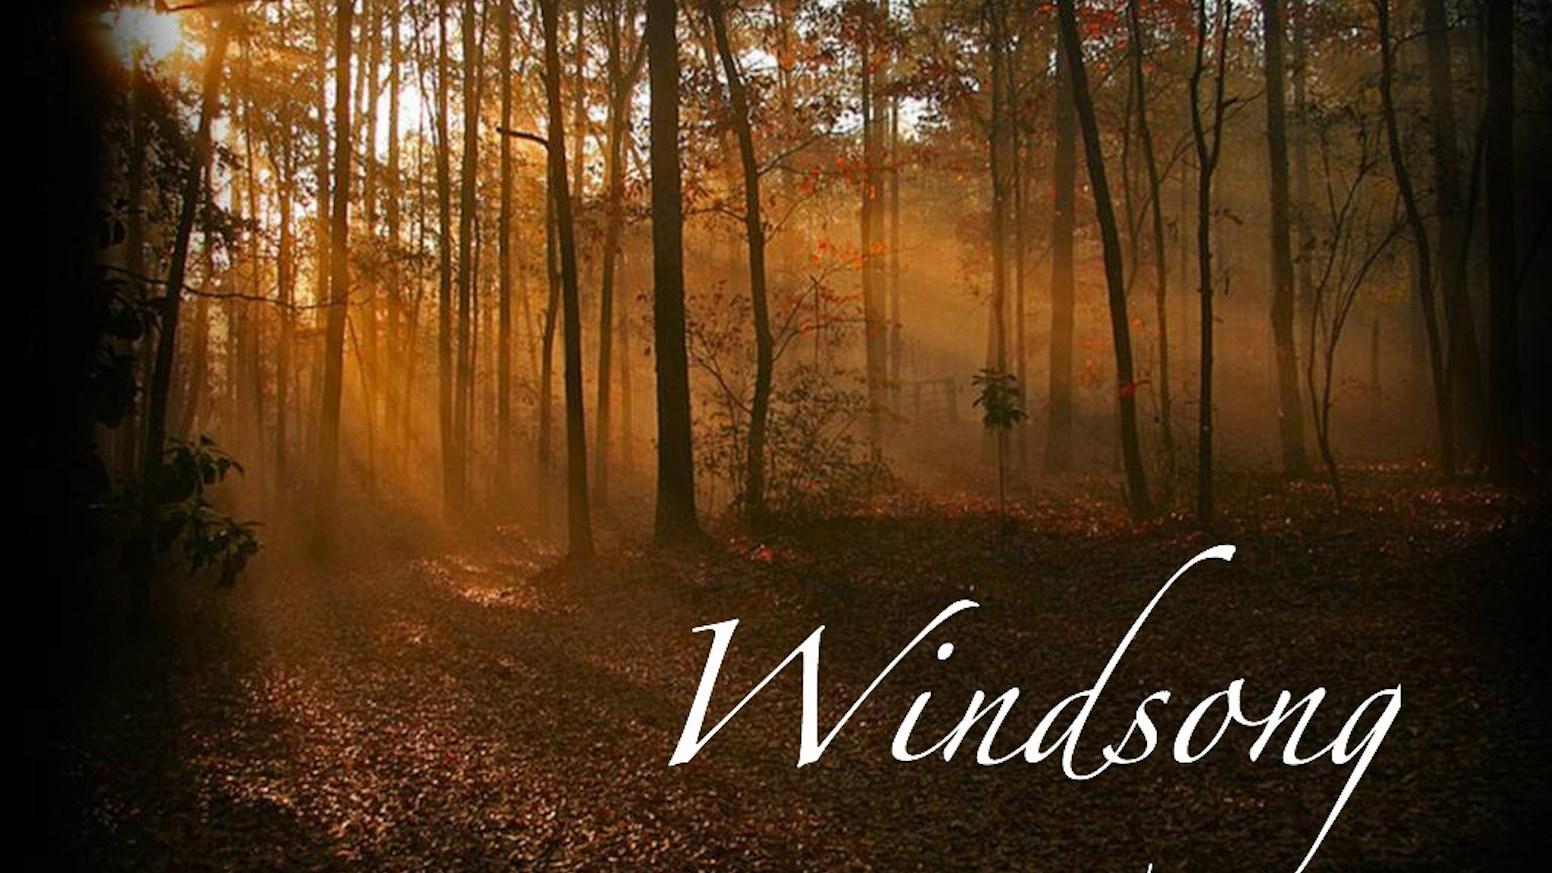 Windsong by Kristina Lally (deleted) — Kickstarter